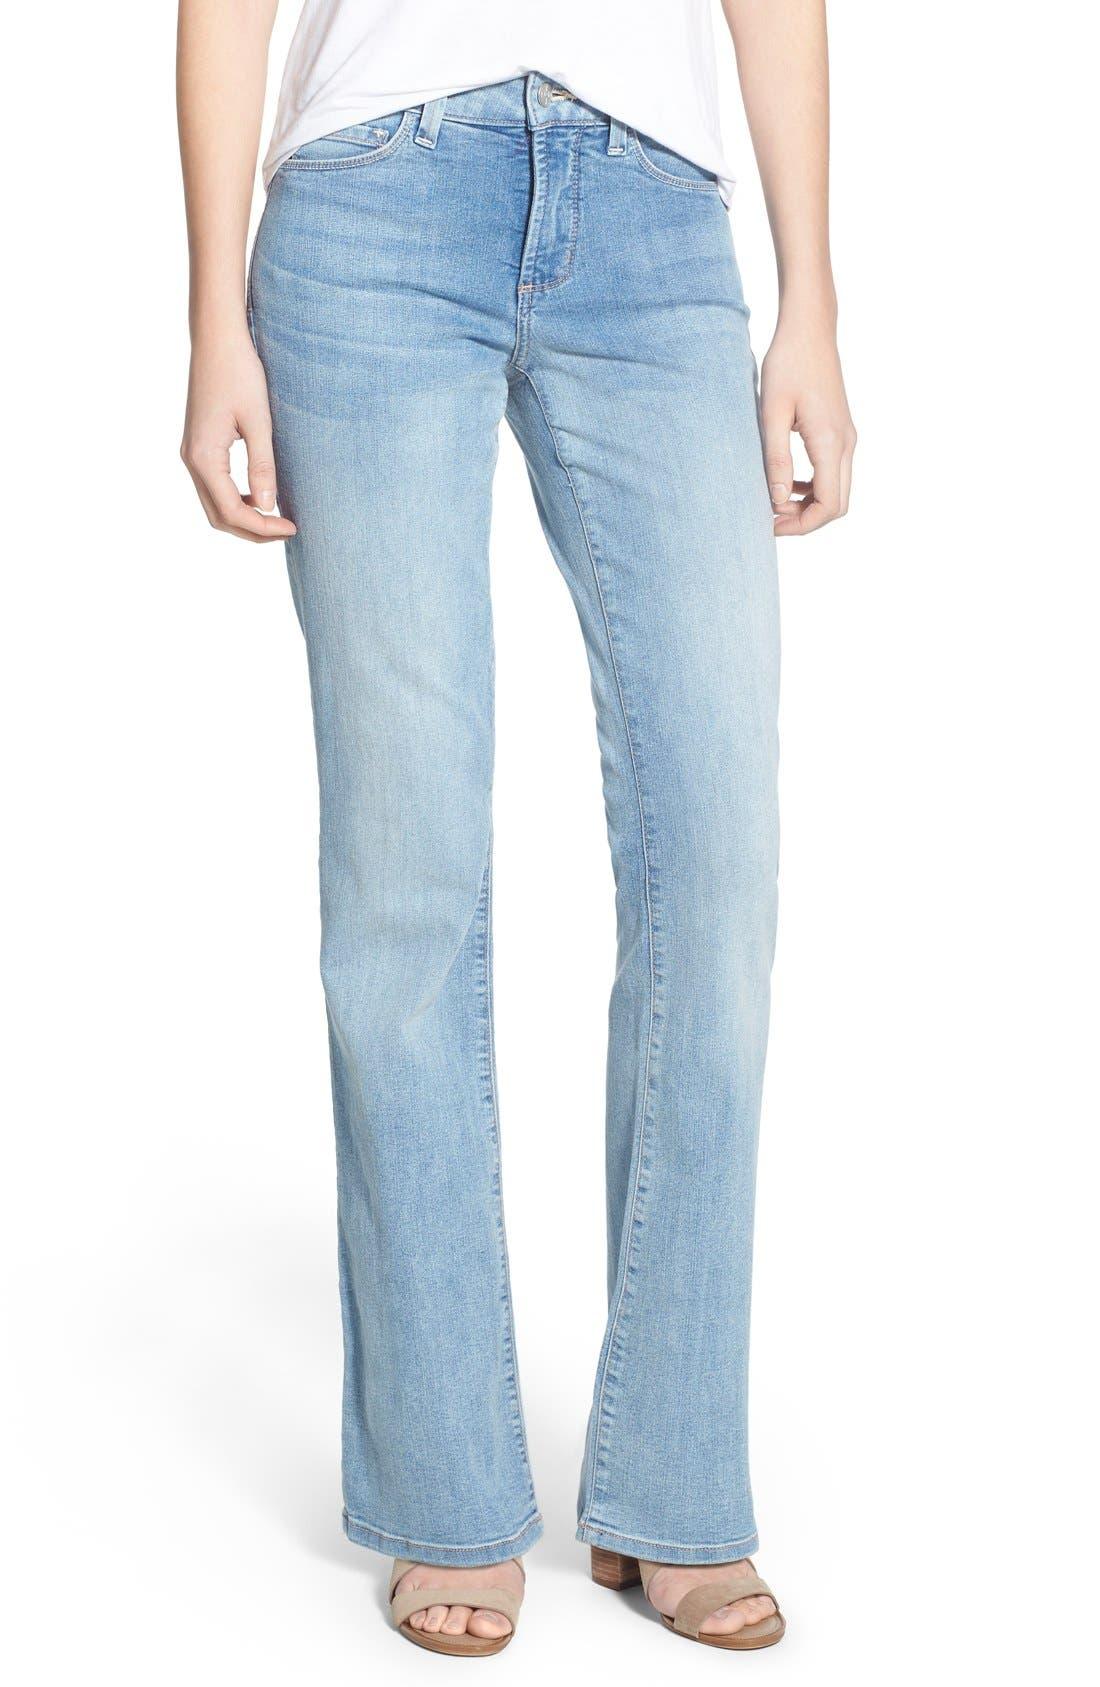 Alternate Image 1 Selected - NYDJ 'Barbara' Stretch Bootcut Jeans (Burbank) (Regular & Petite)